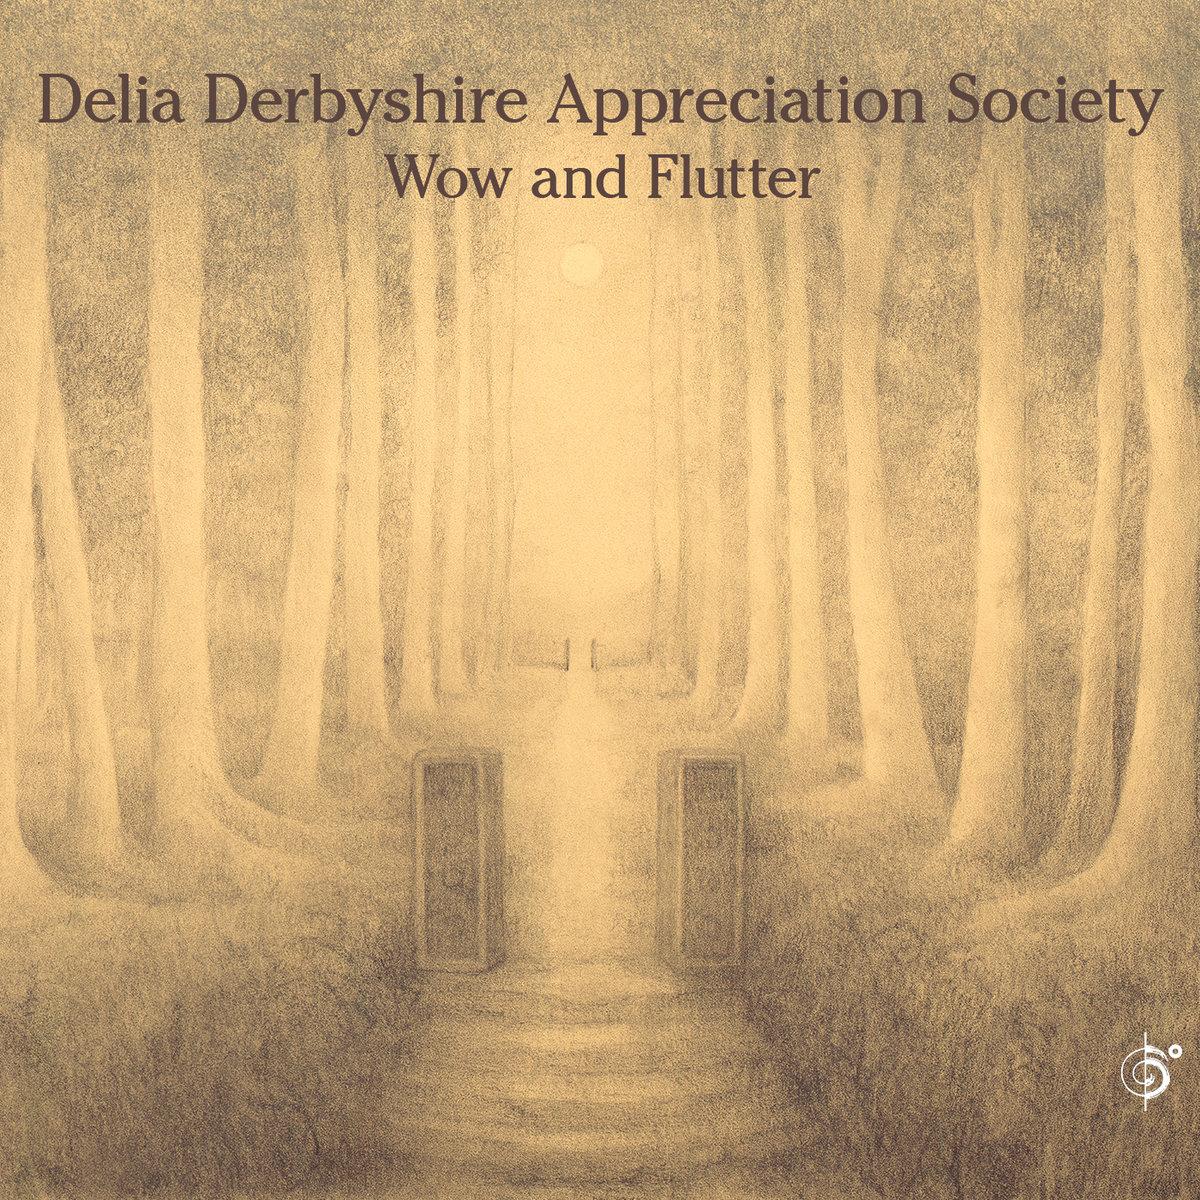 Wow and Flutter | Delia Derbyshire Appreciation Society